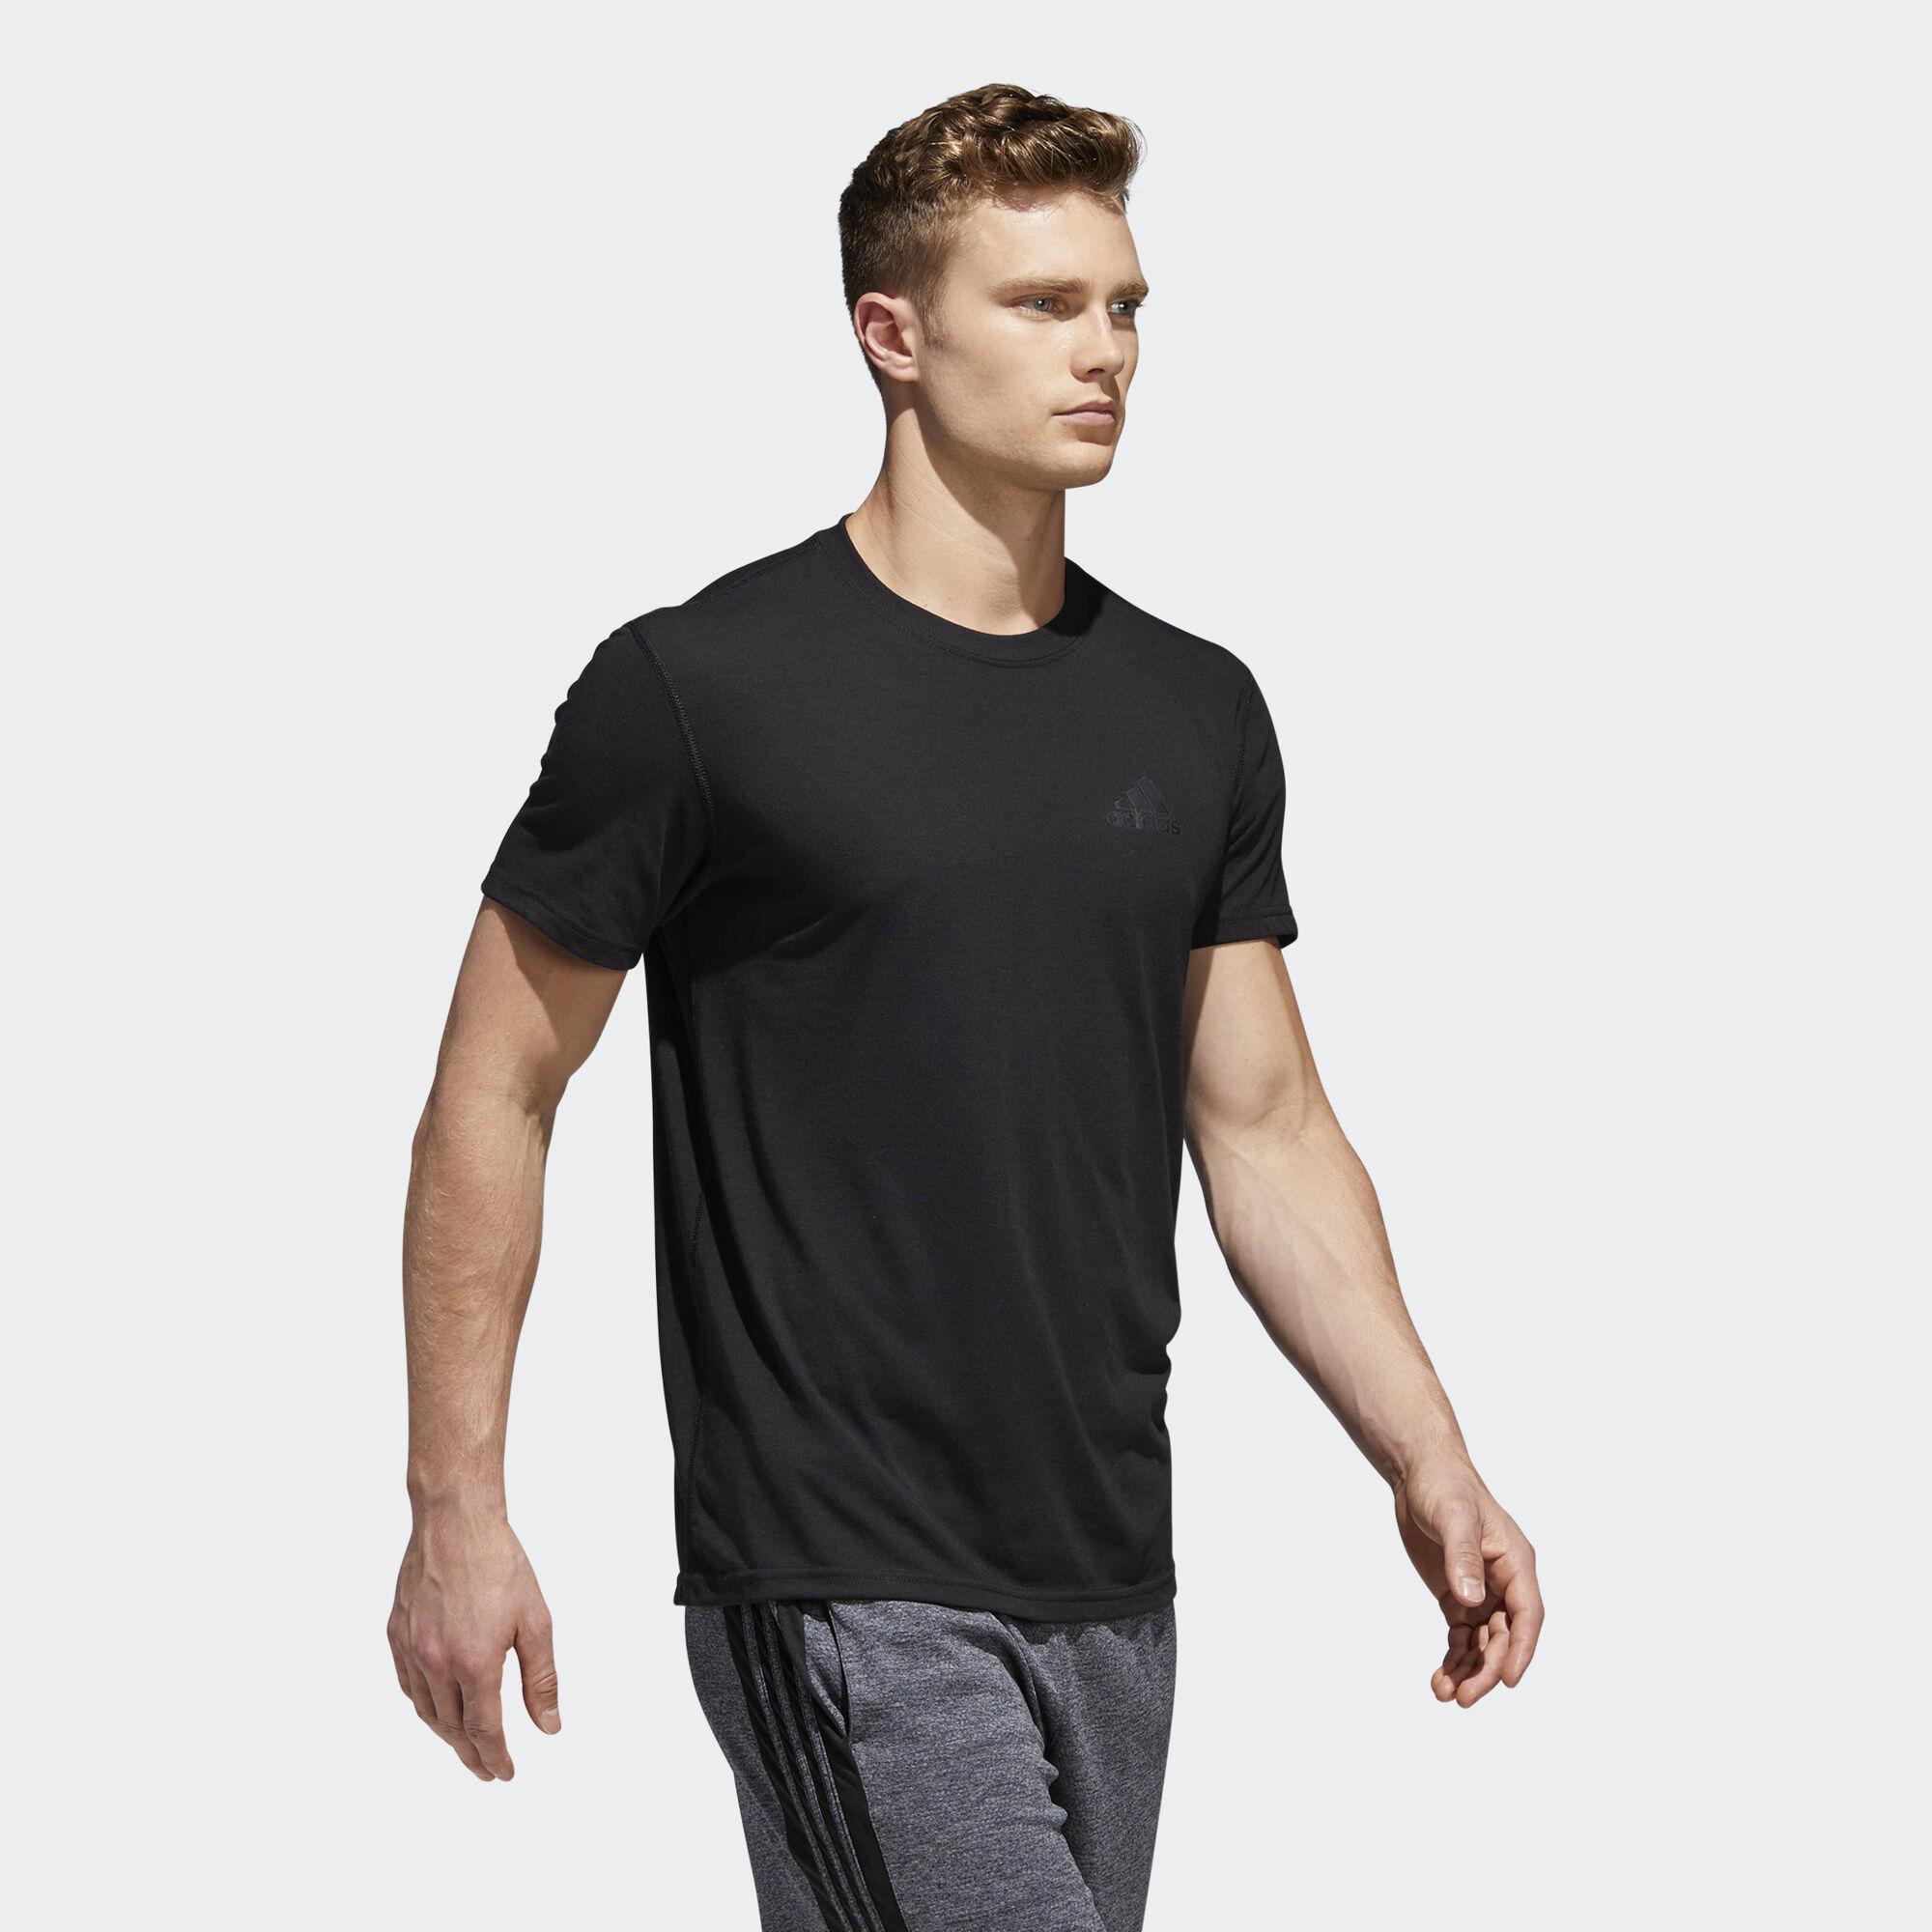 adidas-Ultimate-2-0-Tee-Men-039-s